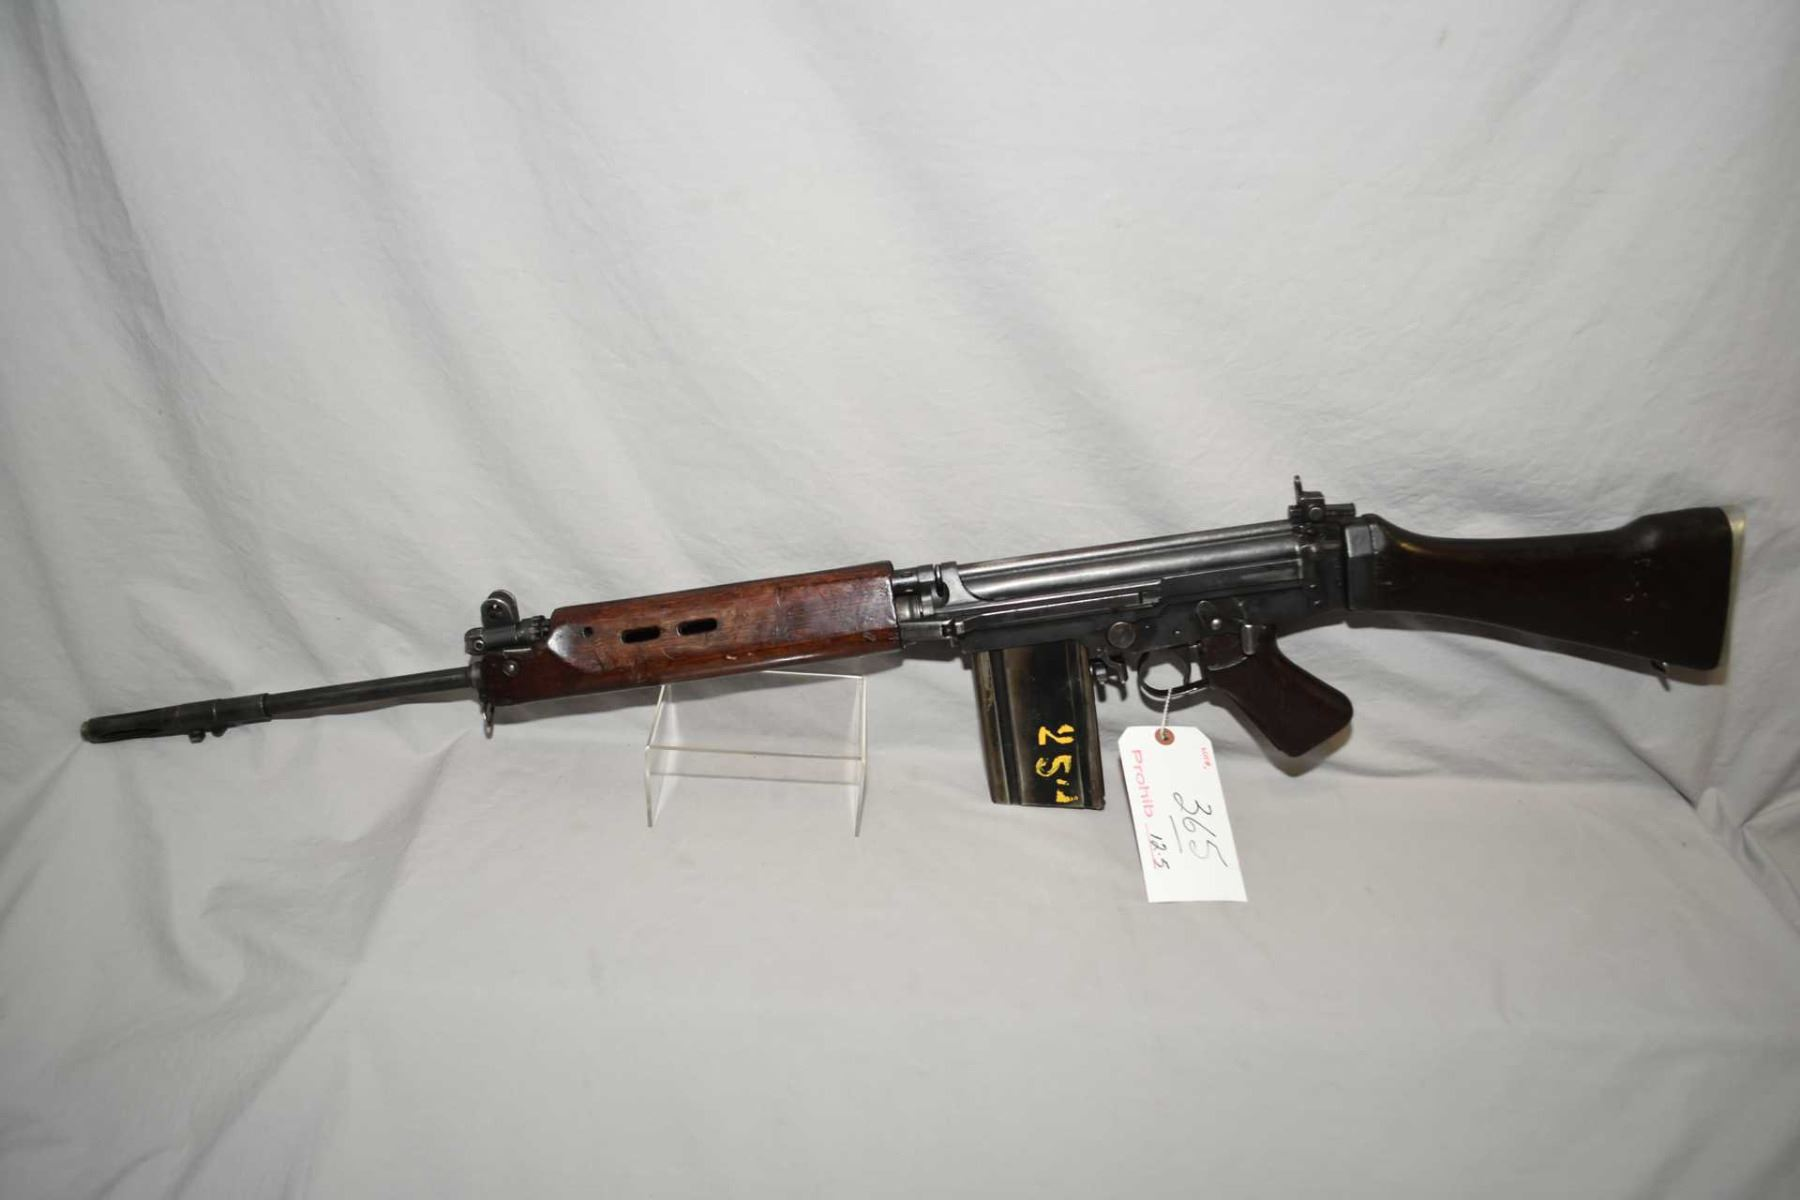 FN FAL Model IA1 7 62 Nato Cal 5 Shot Full Wood Military Semi